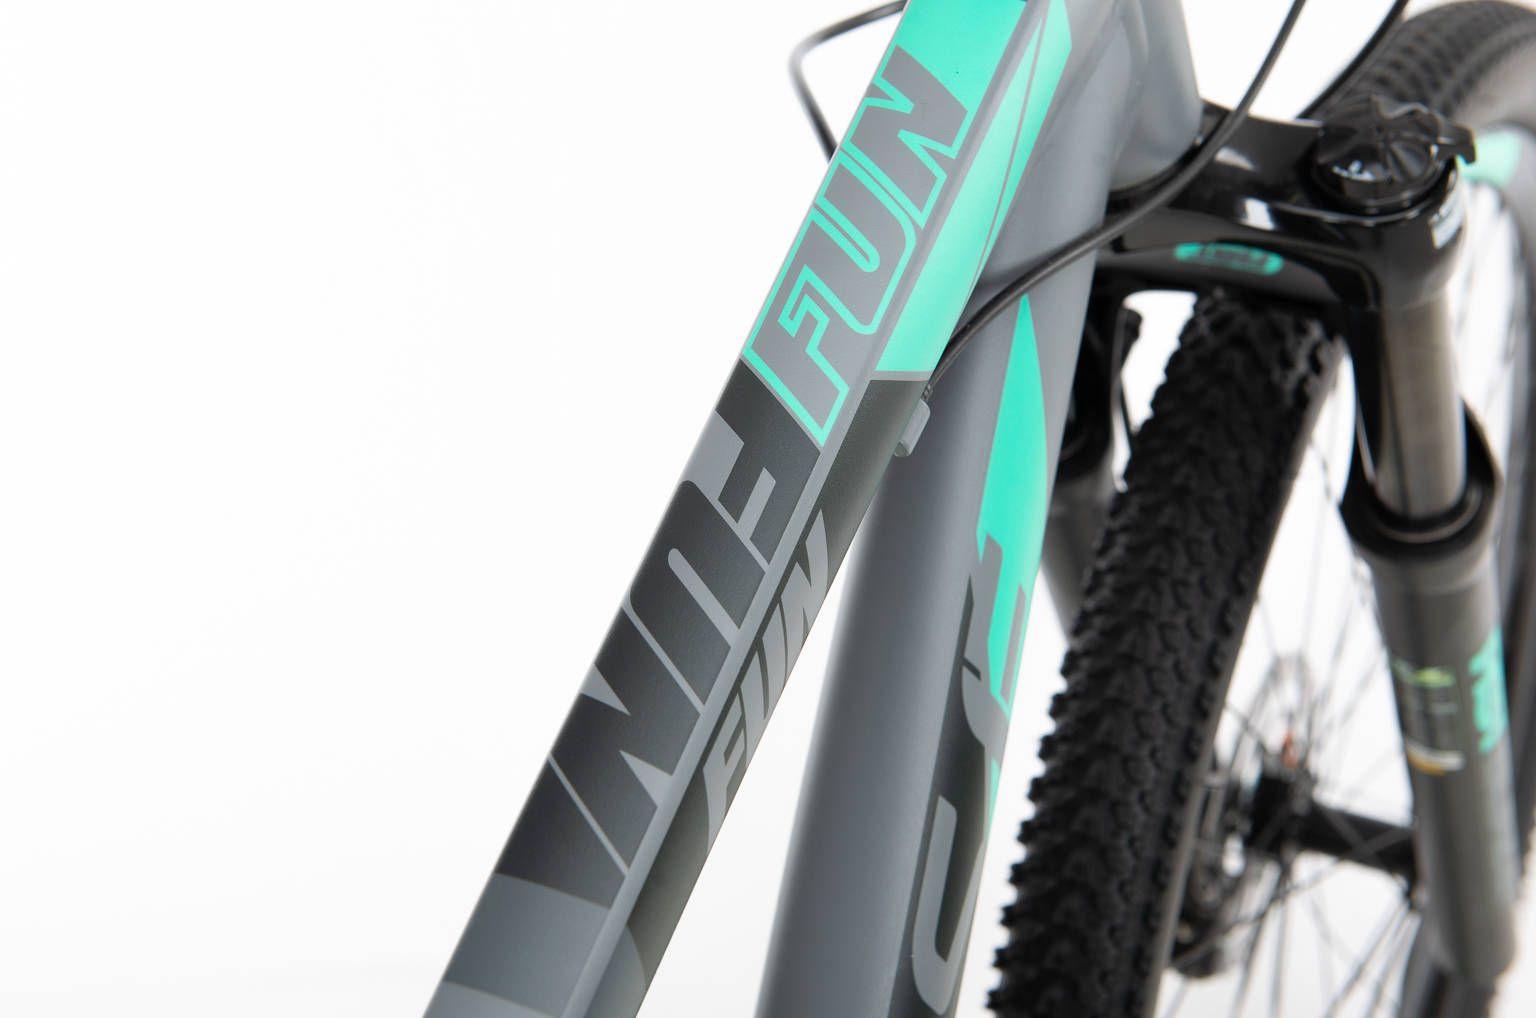 Bicicleta SENSE Fun 2020 - 24v Shimano Acera - Cinza/Acqua